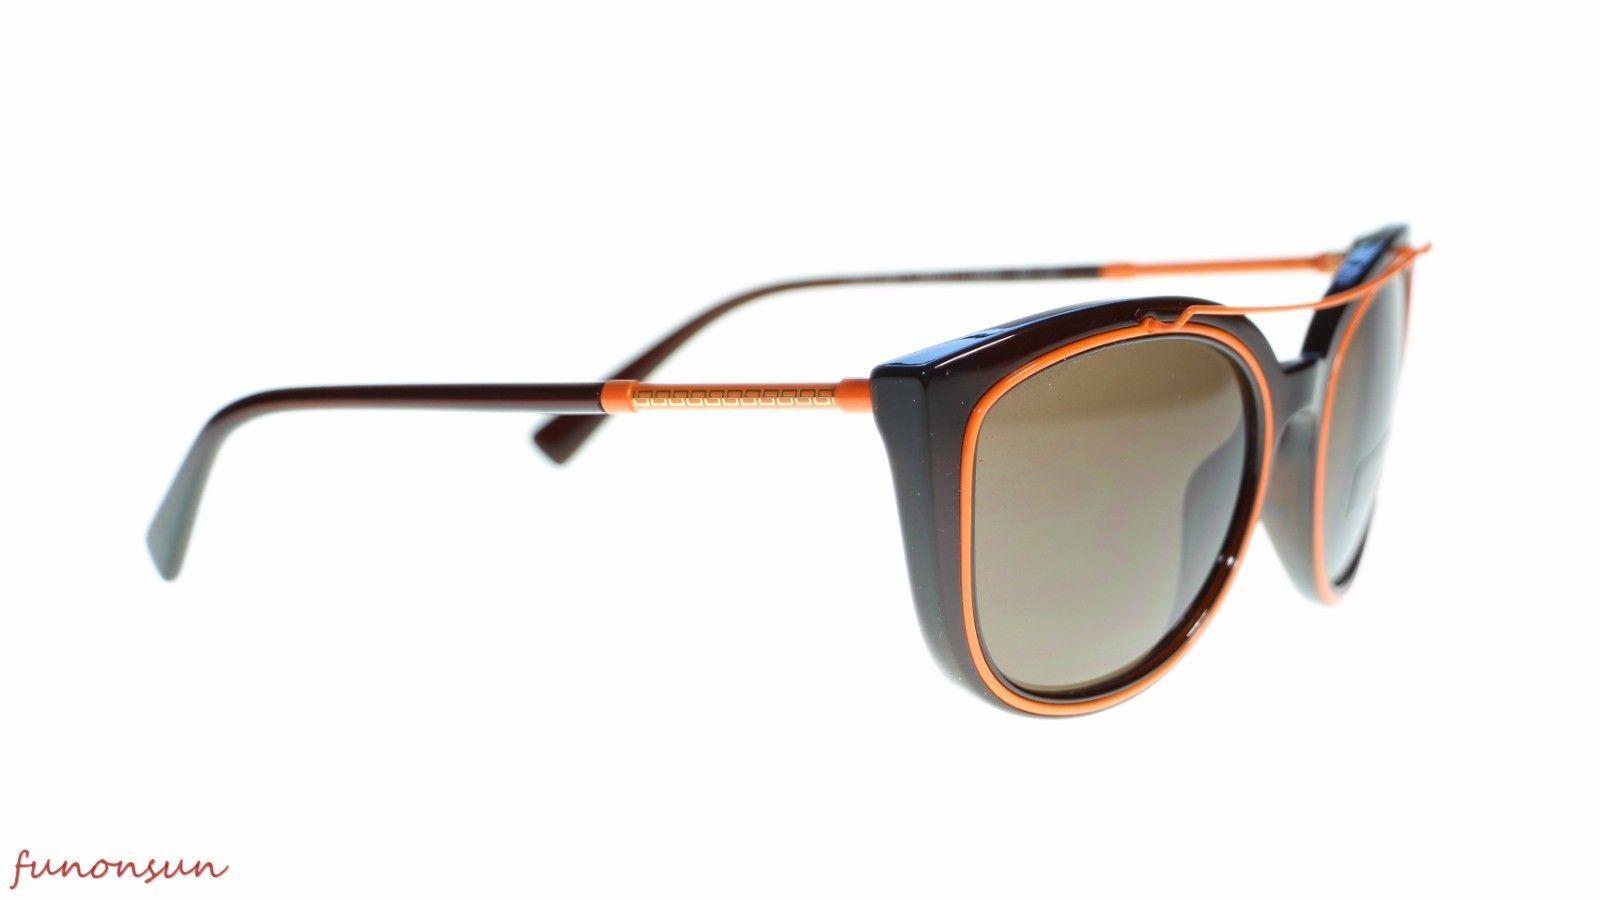 Versace Cat Eye Women's Sunglasses VE4336 509373 Transparent Brown Lens 56mm